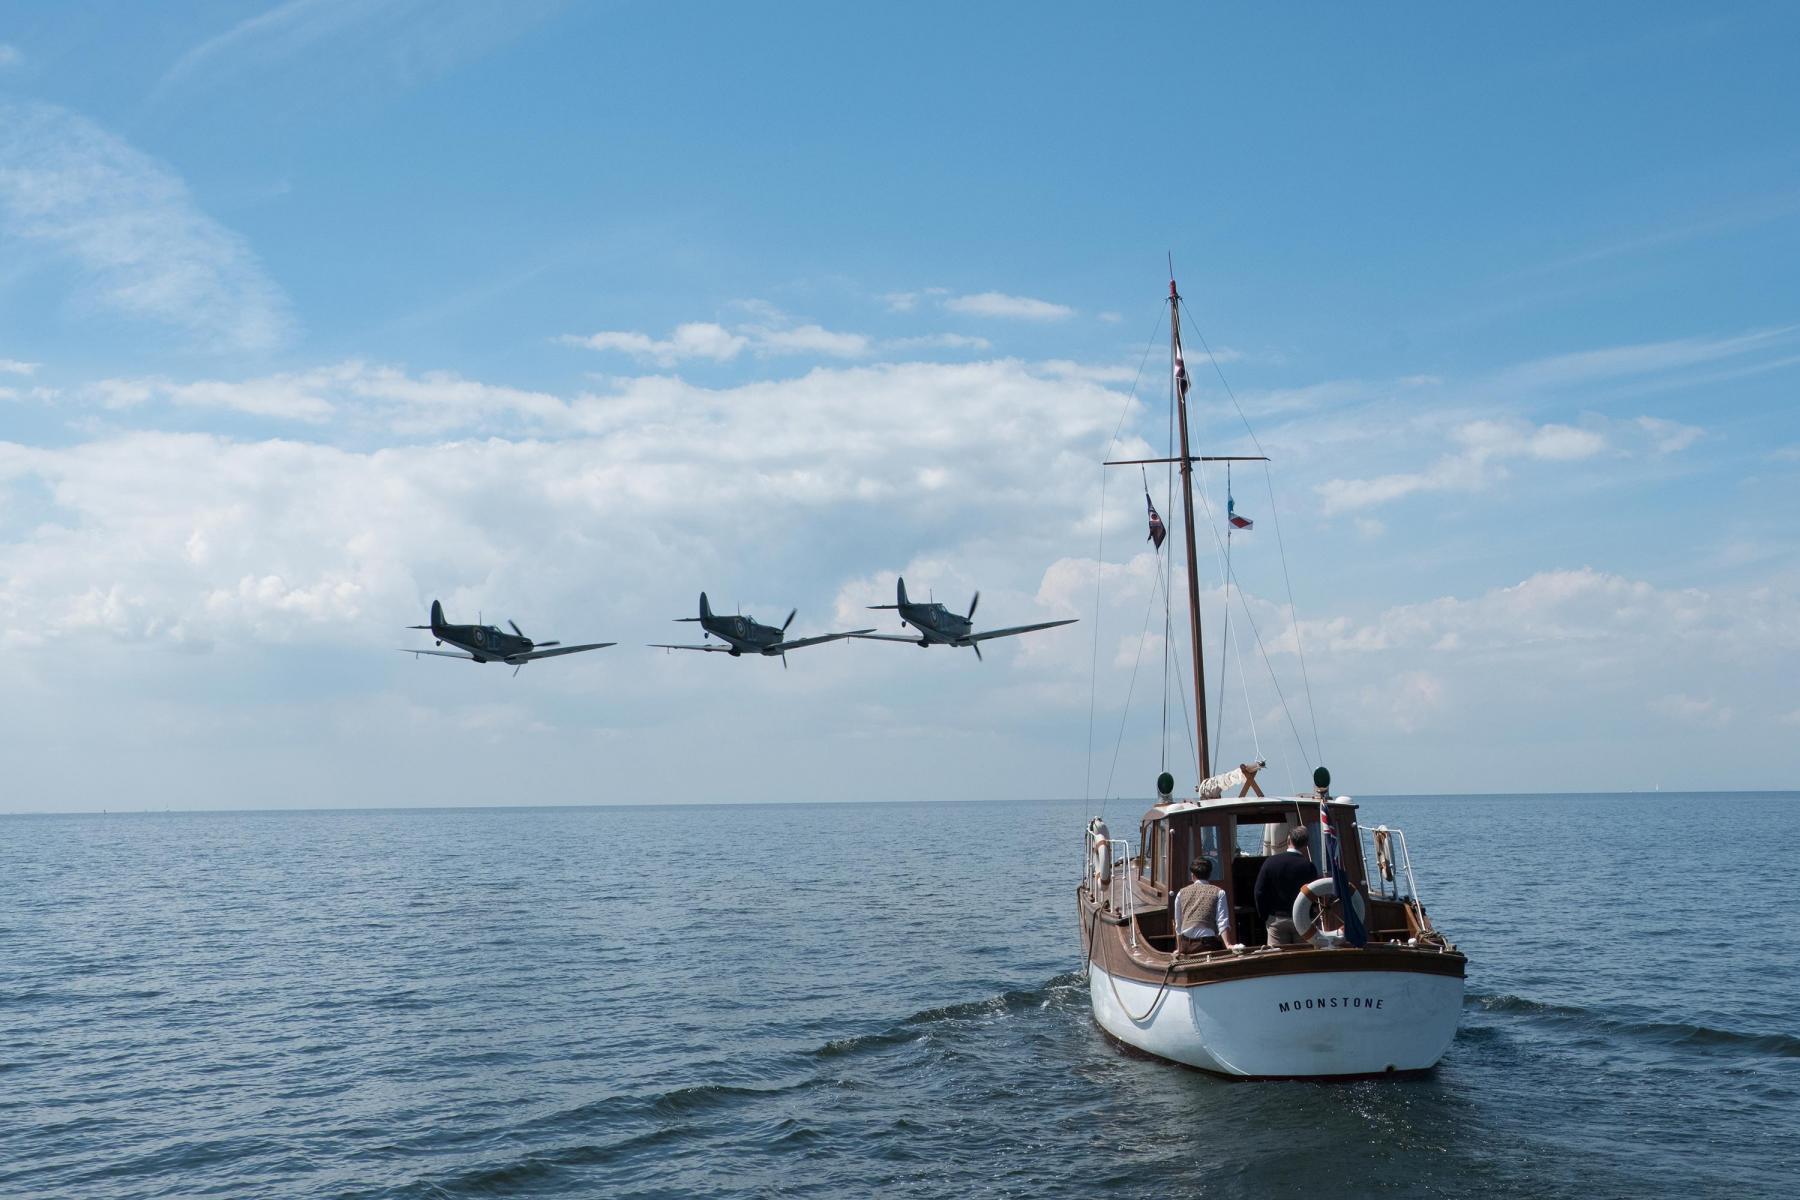 Dunkerque | Dunkirk | Crítica de cine